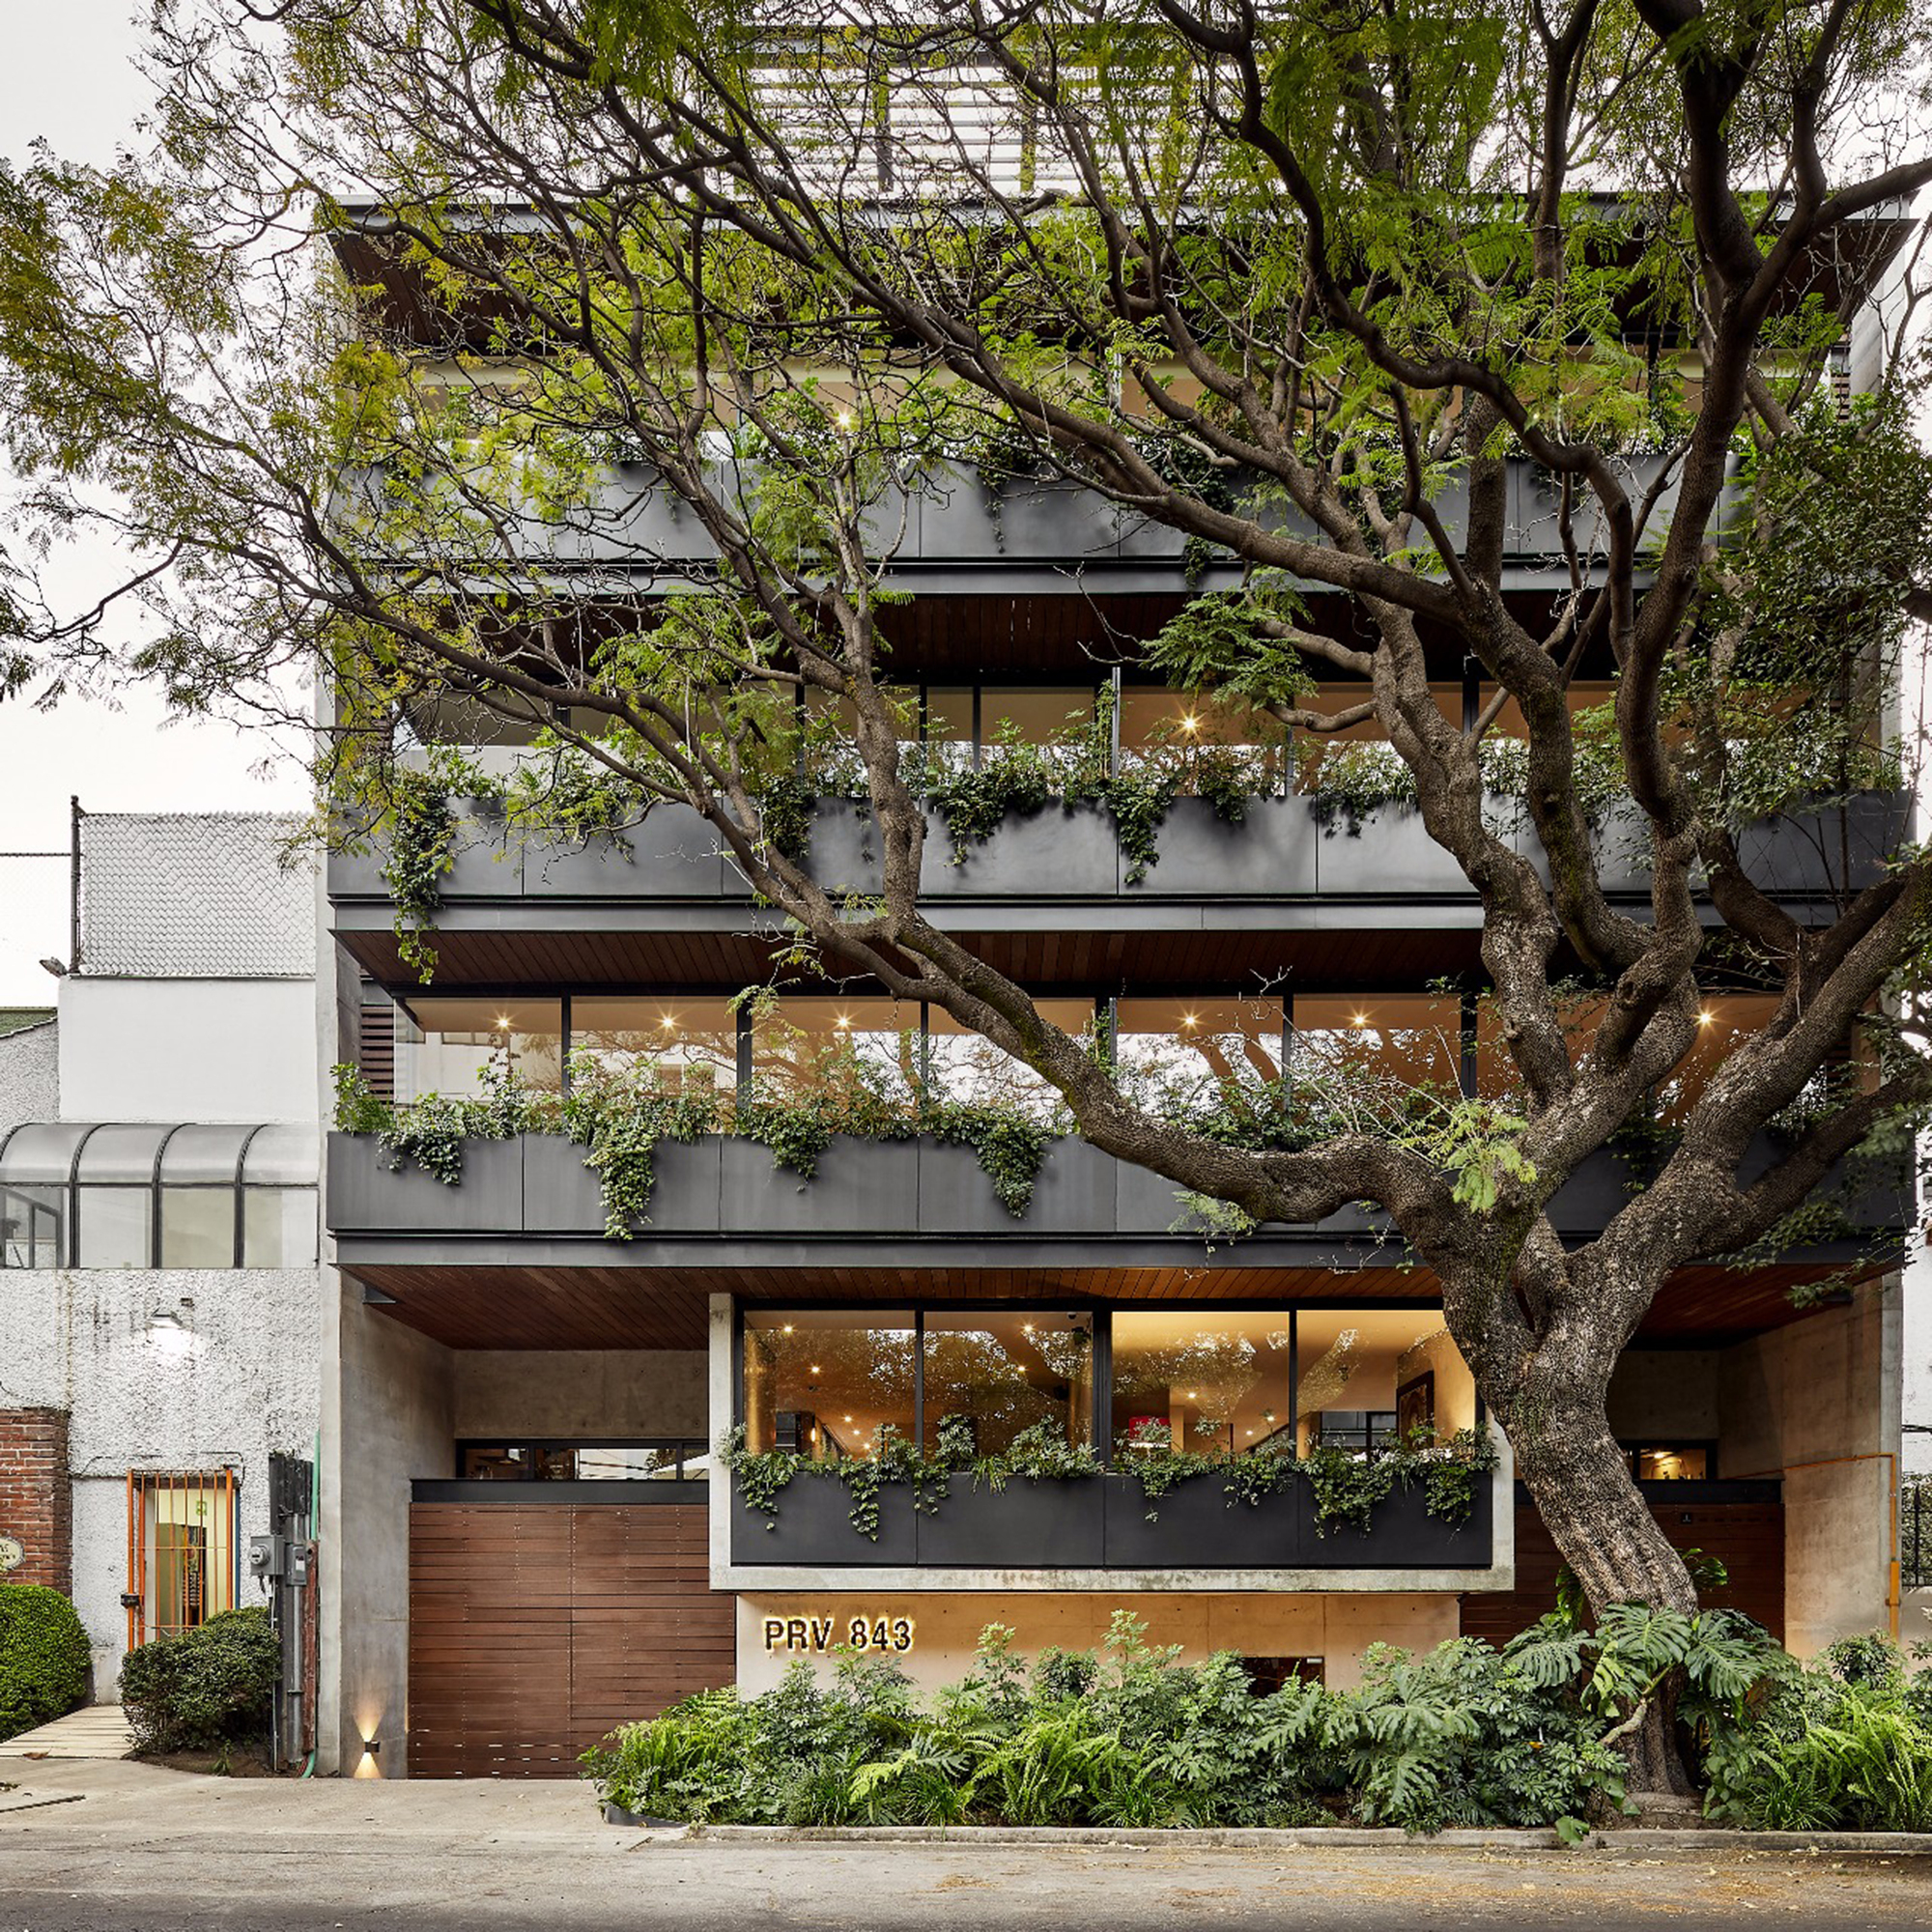 PRV 843 Building / JL arquitectos